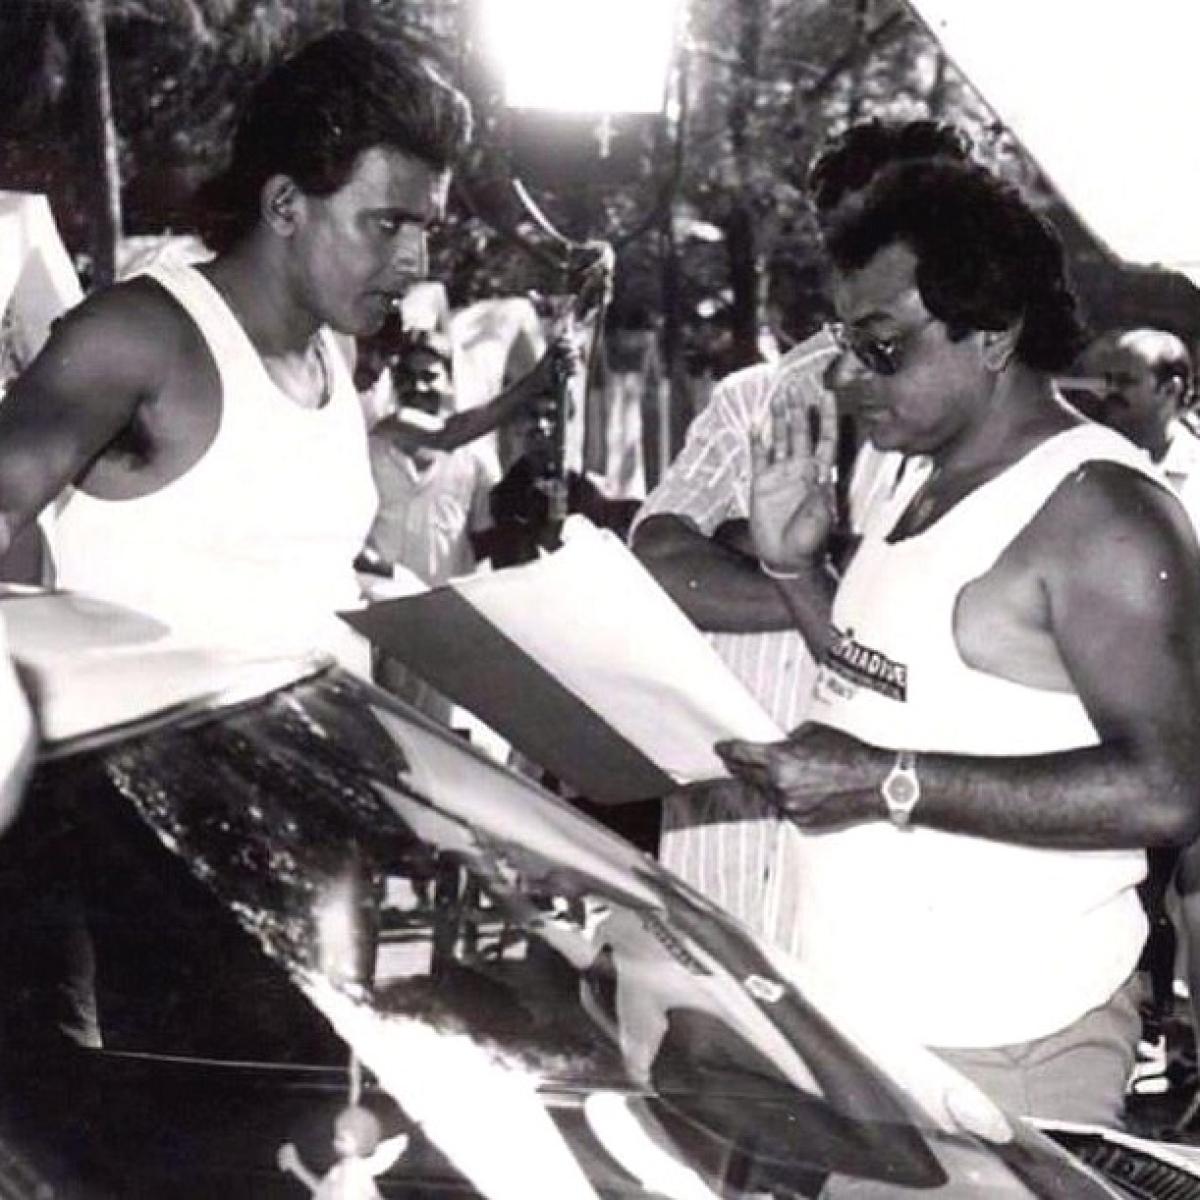 Moments & Memories: When jaundice couldn't deter the Disco Dancer